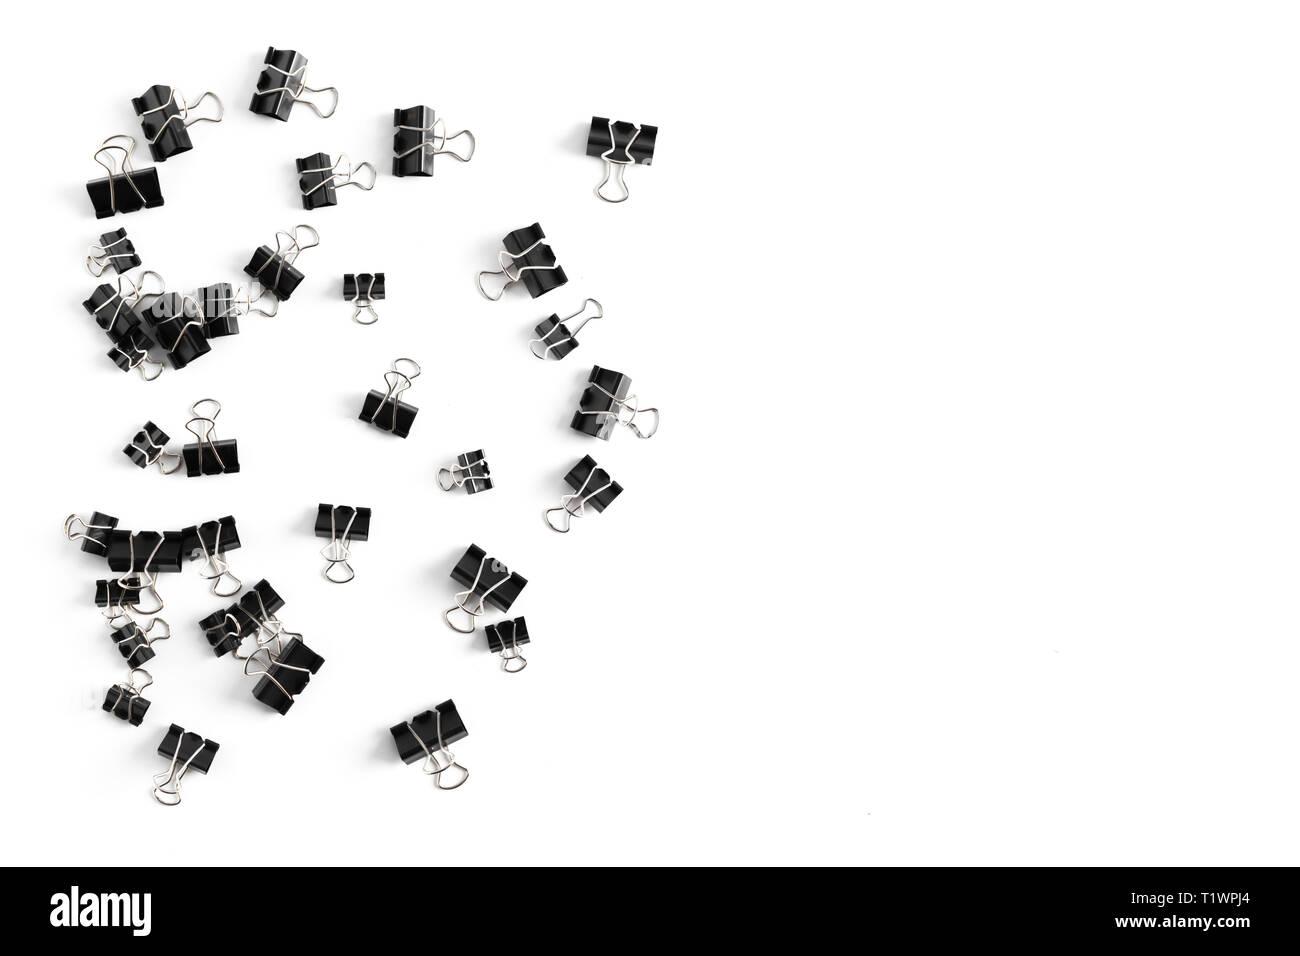 Clip for document or paper clip attachment - Stock Image